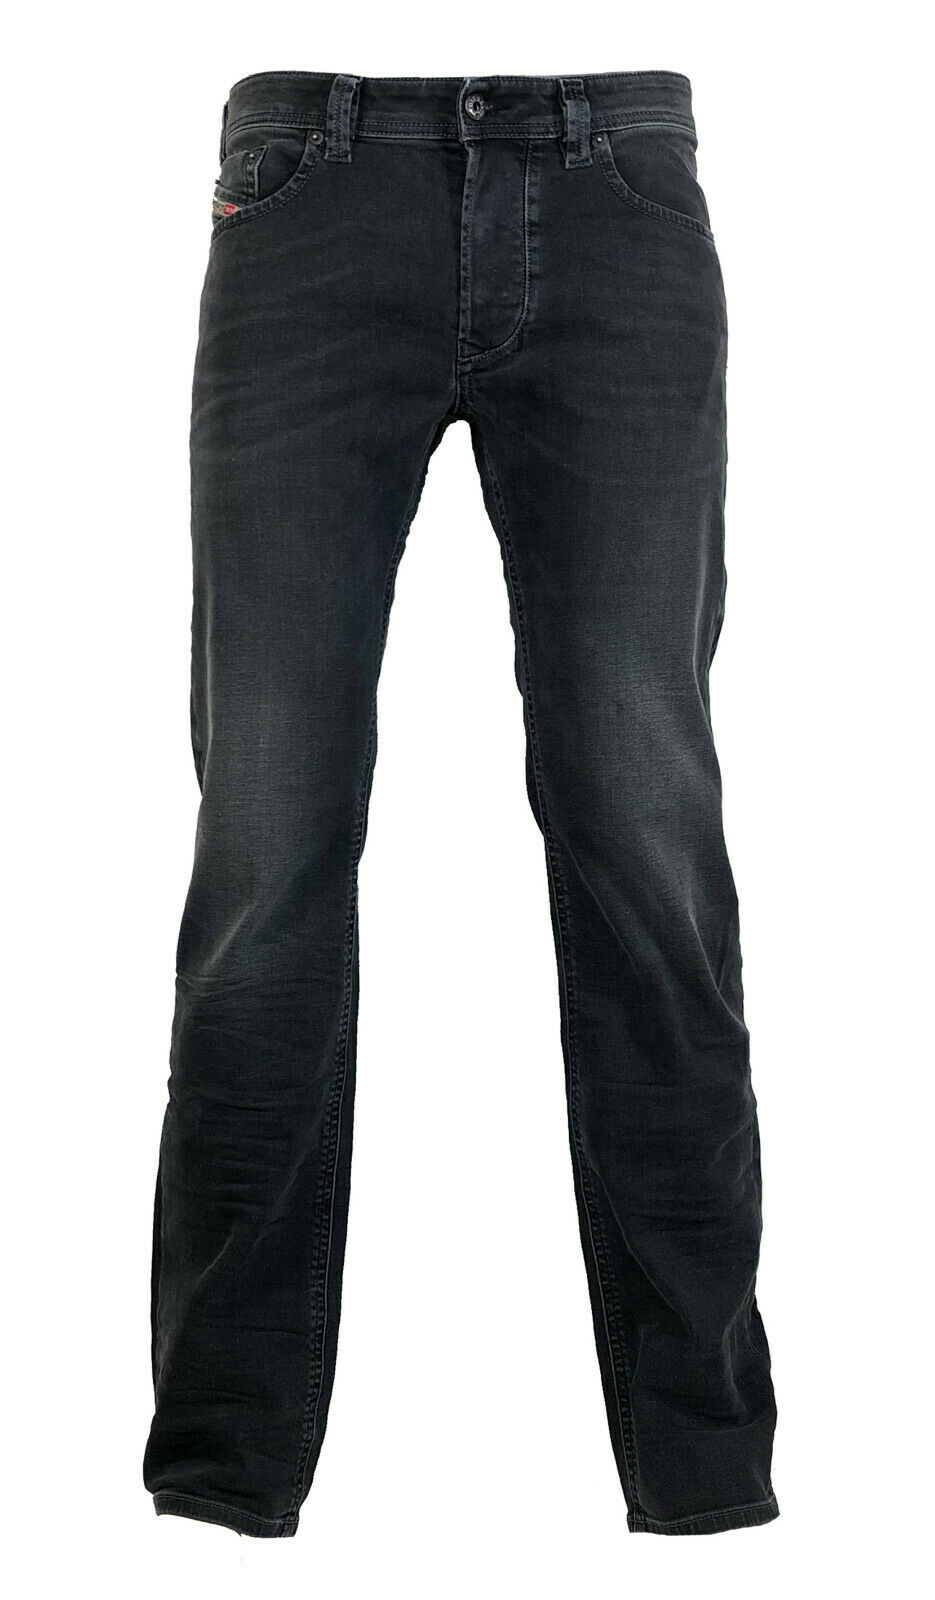 Diesel  Straight Cut  Stretch Jeans LARKEE R9F66 anthrazit  Gr. 31 32 NEU